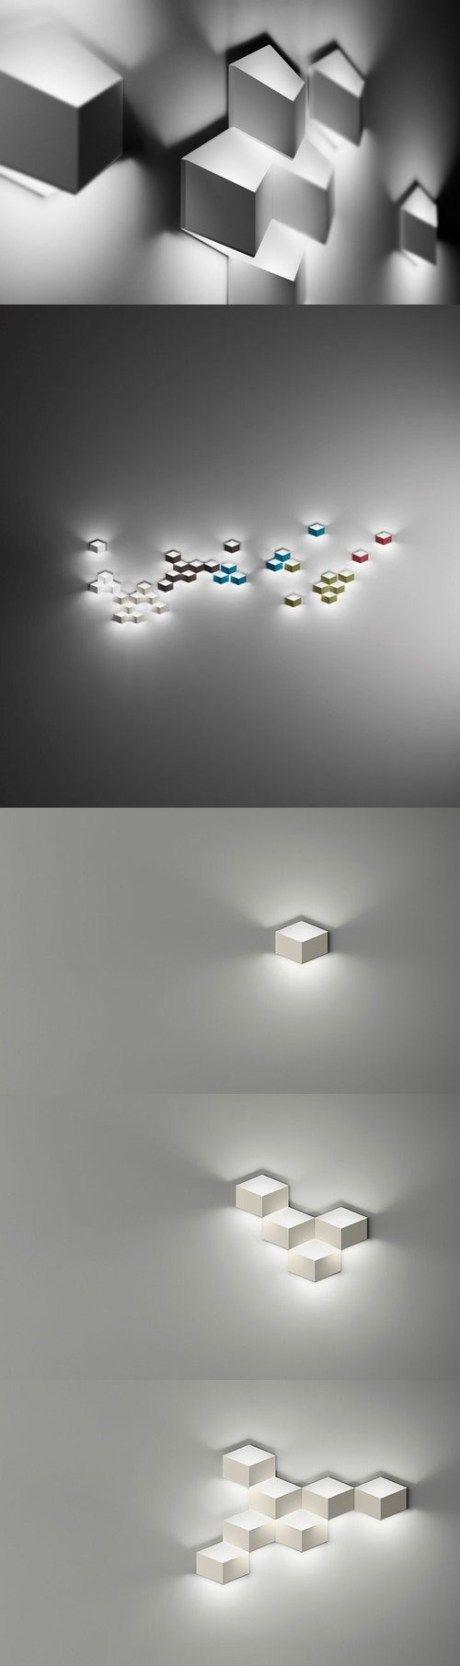 Modular lighting - Lumières modulables éclairage maison